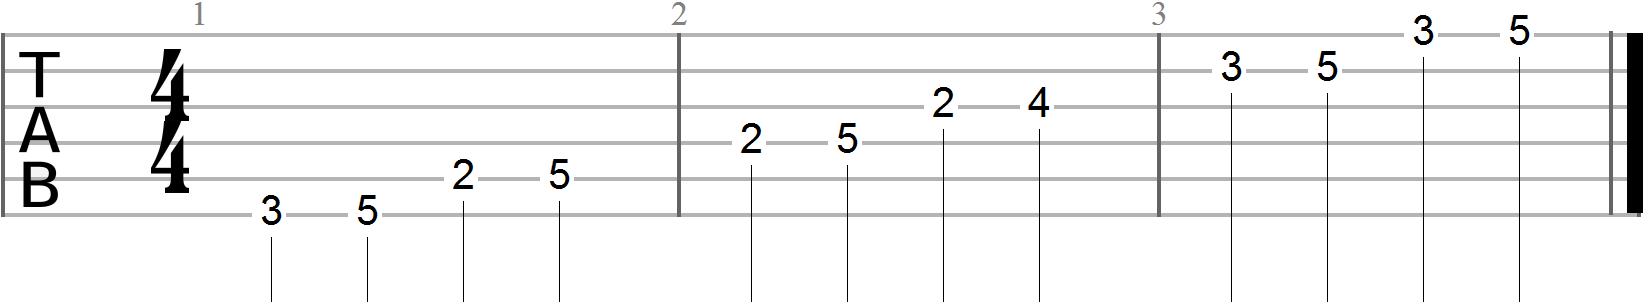 Eric Johnson Major Pentatonic Scale Diagram: Eric Clapton Fender Strat Wiring Diagrams At Anocheocurrio.co